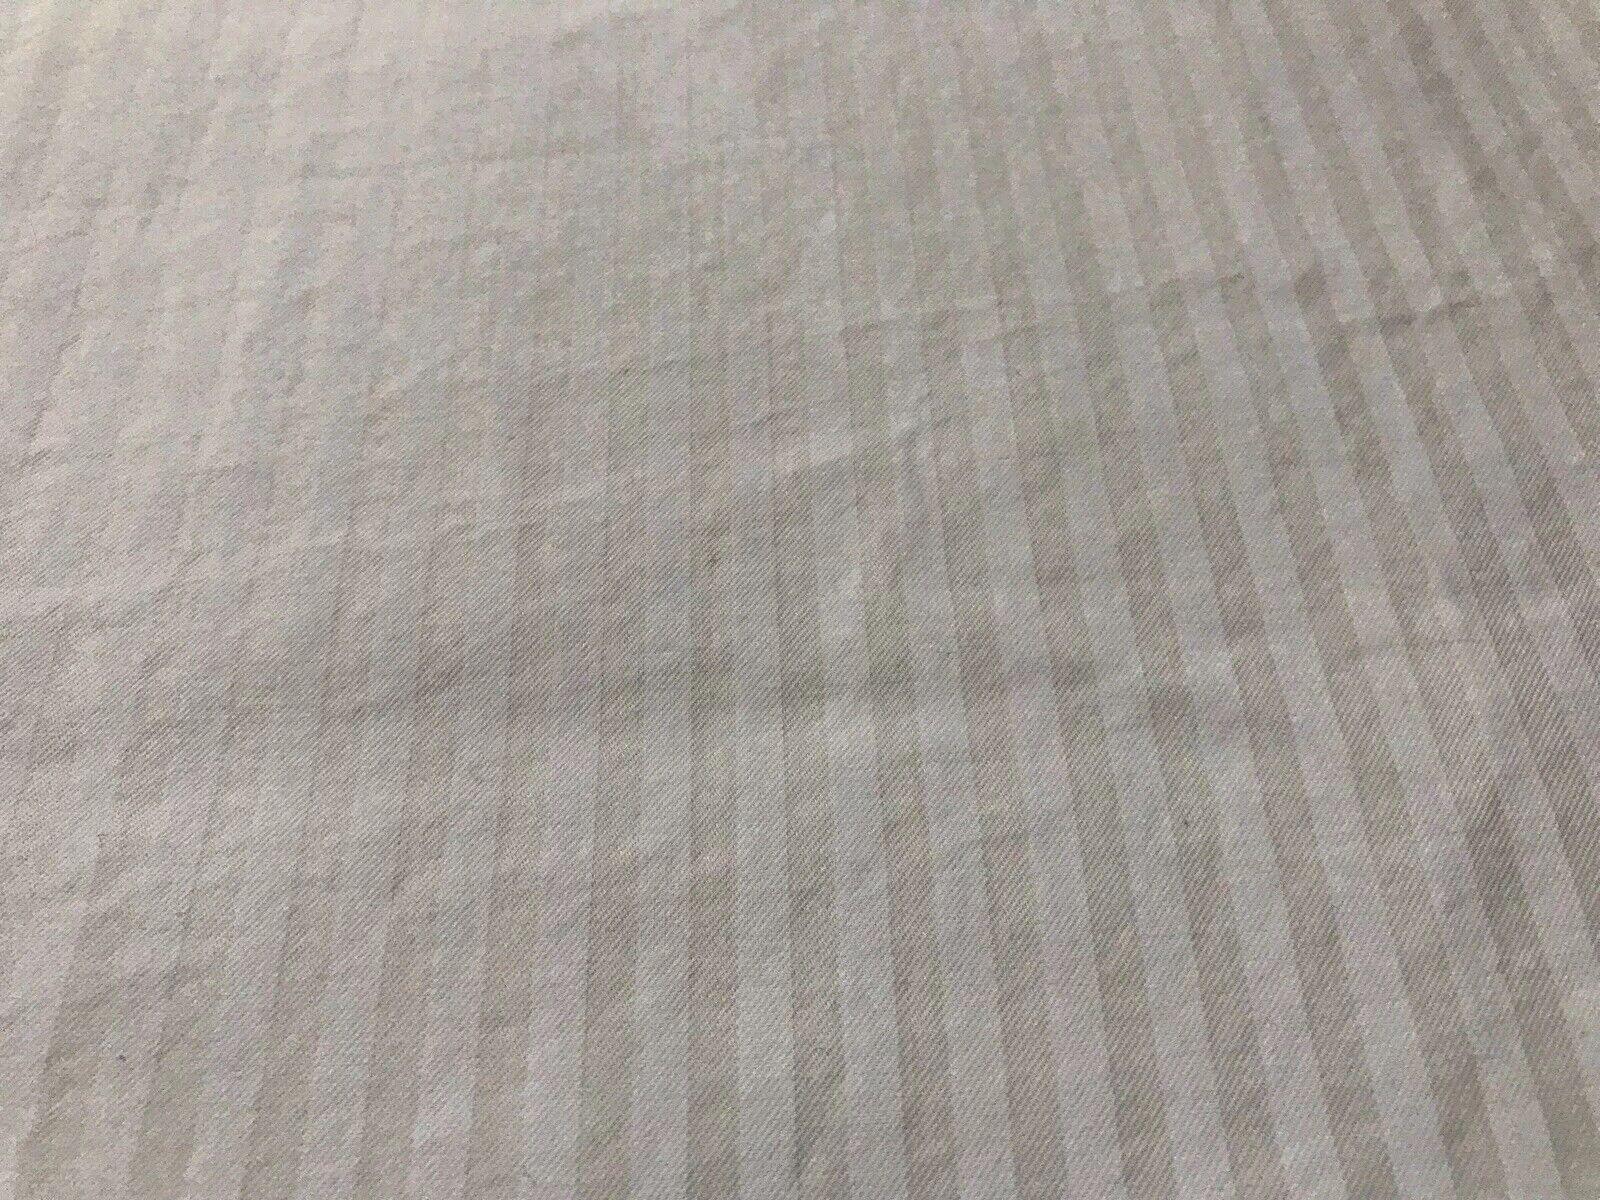 Charisma By Fieldcrest Vintage Full Queen Duvet Cover Light Lines Supima Cotton